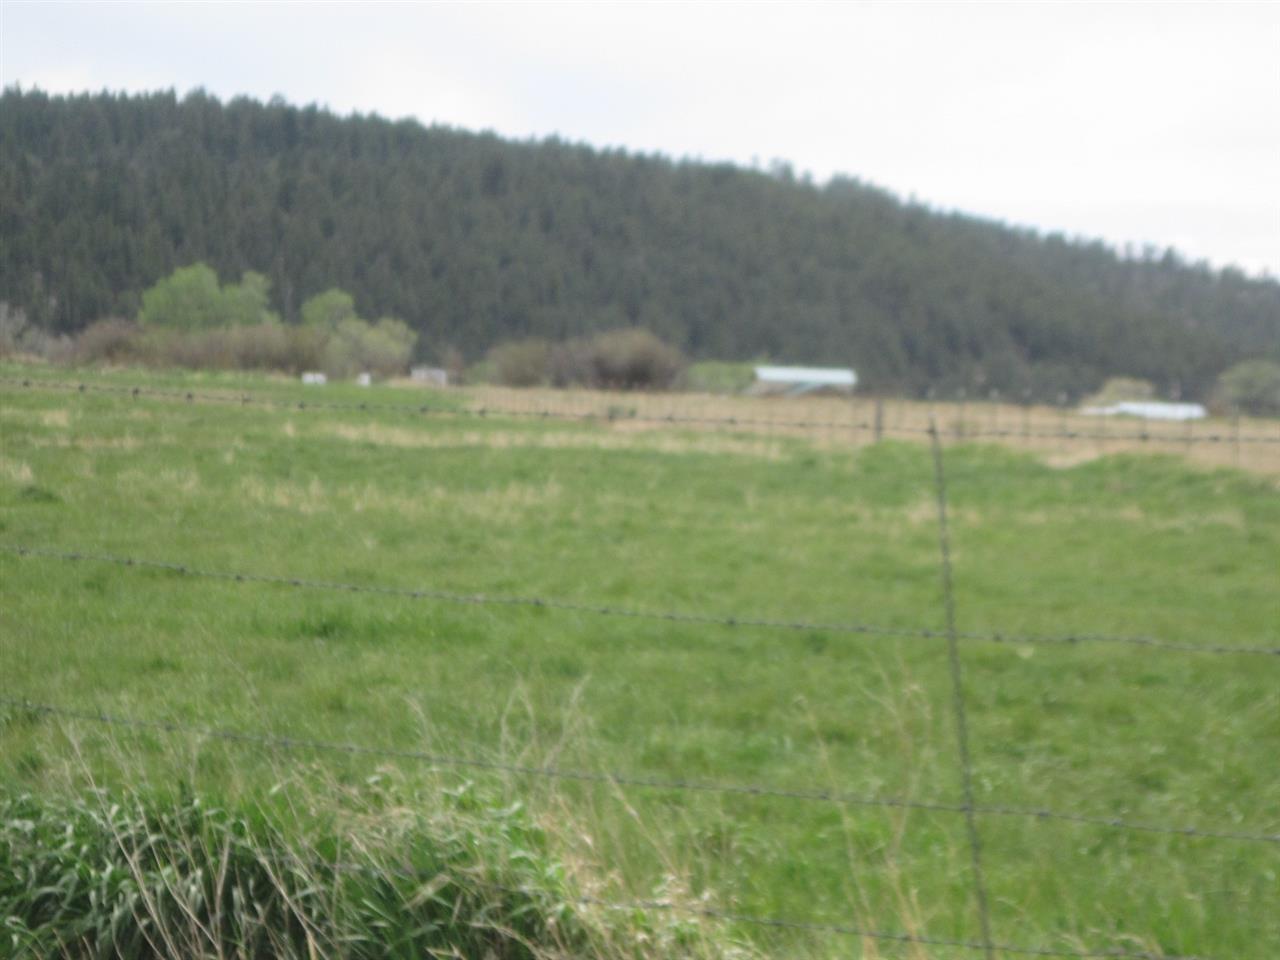 Highway 84 Private Drive, Tierra Amarilla NM 87575 - Photo 2